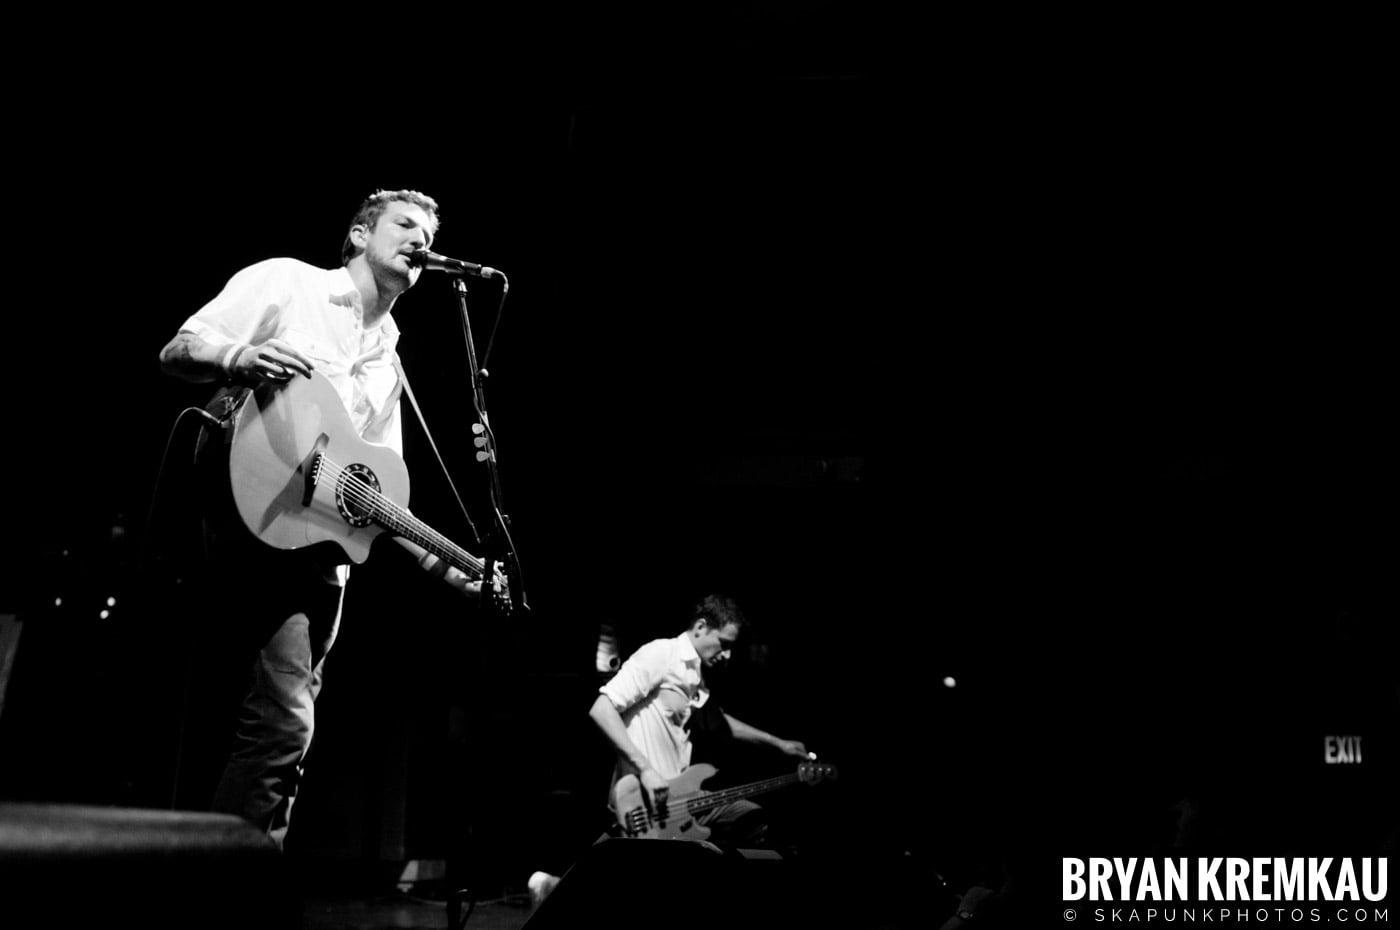 Frank Turner & The Sleeping Souls @ Webster Hall, NYC - 9.29.12 (9)